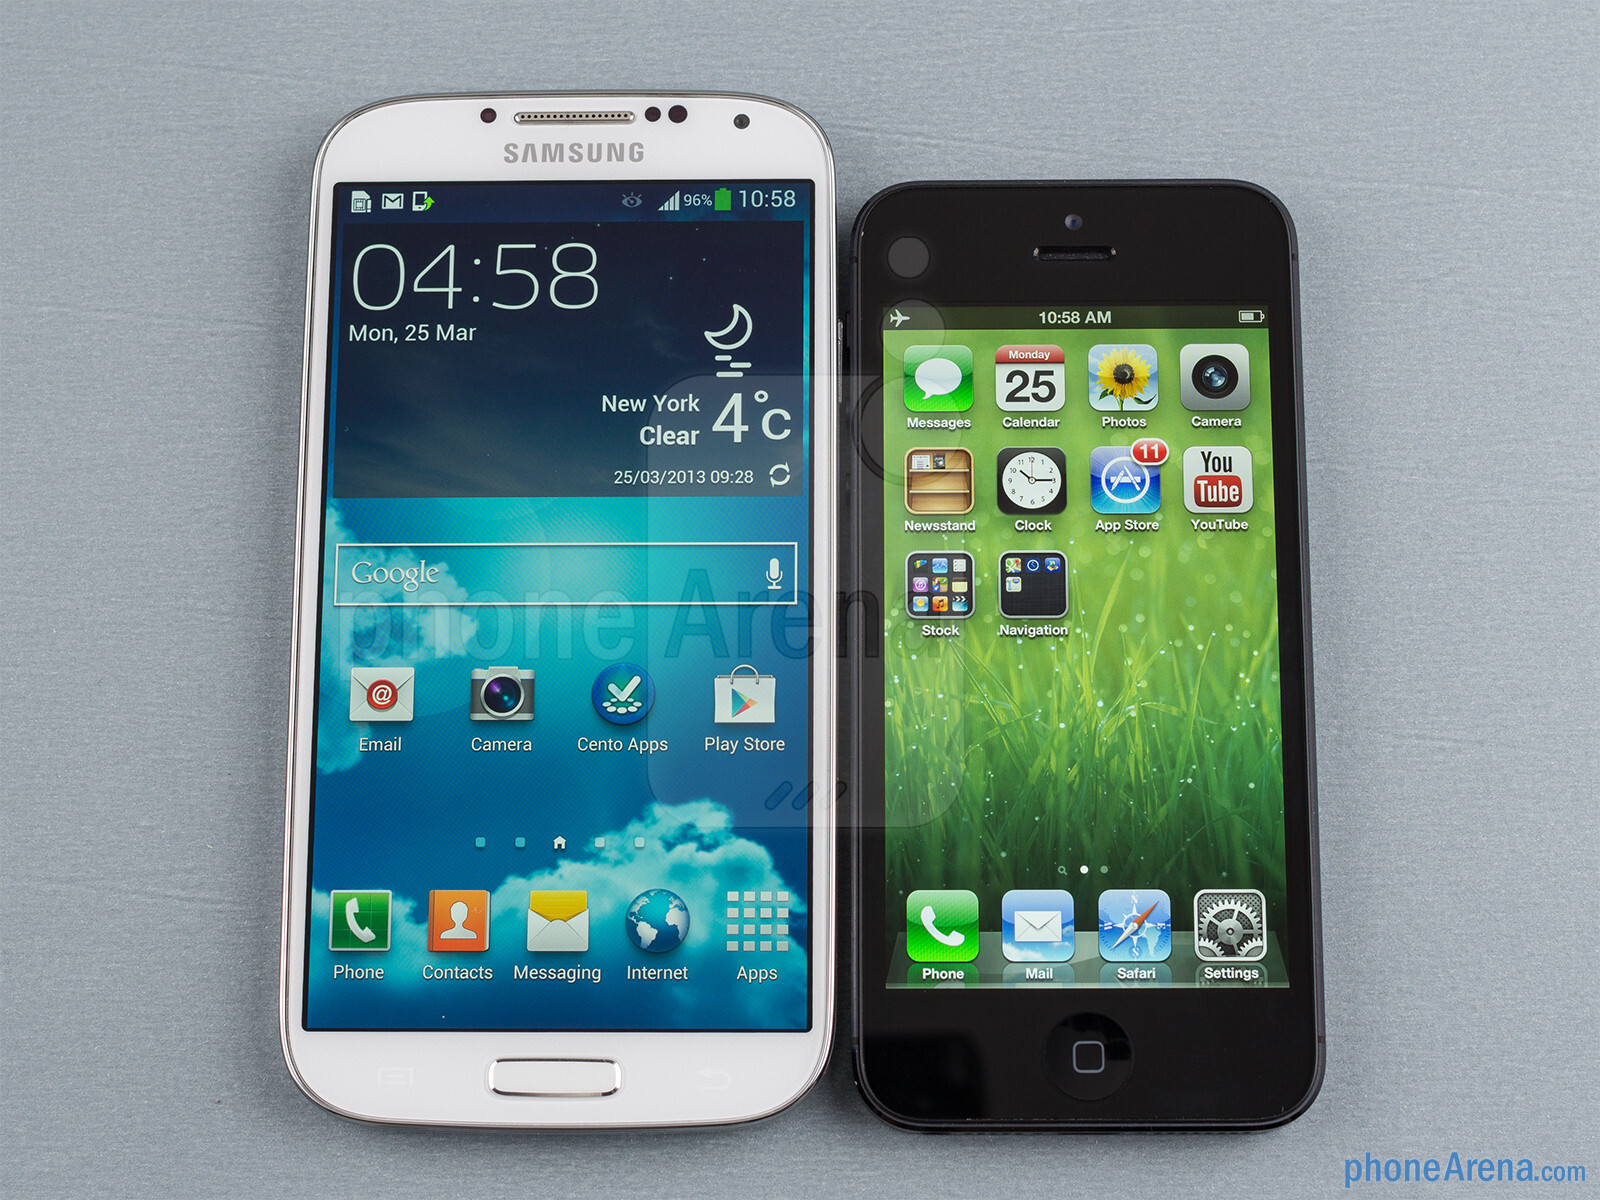 iphone 4 vs galaxy s4